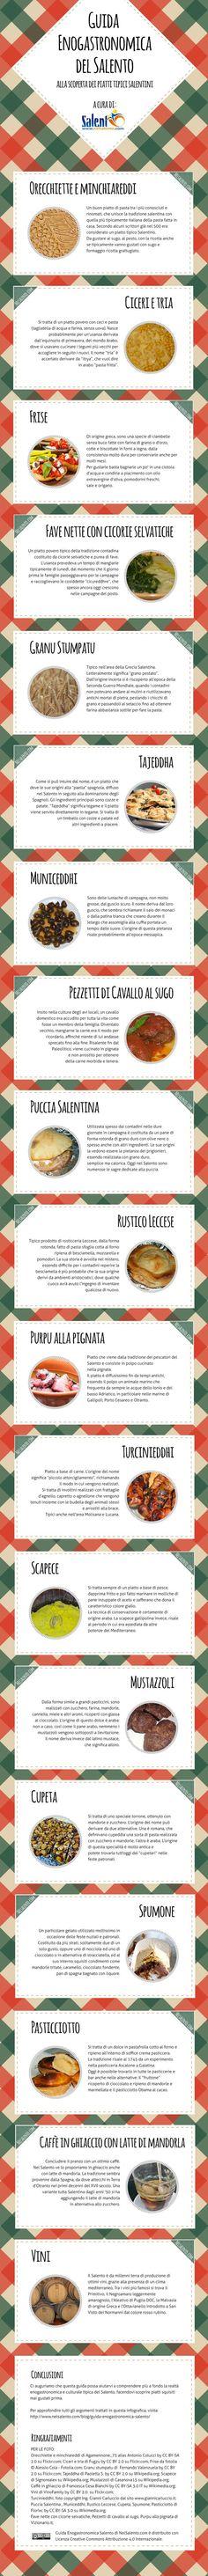 20 Ricette salentine da provare assolutamente  http://www.ledolciricette.it/2014/05/09/20-ricette-salentine-da-provare-assolutamente/15915